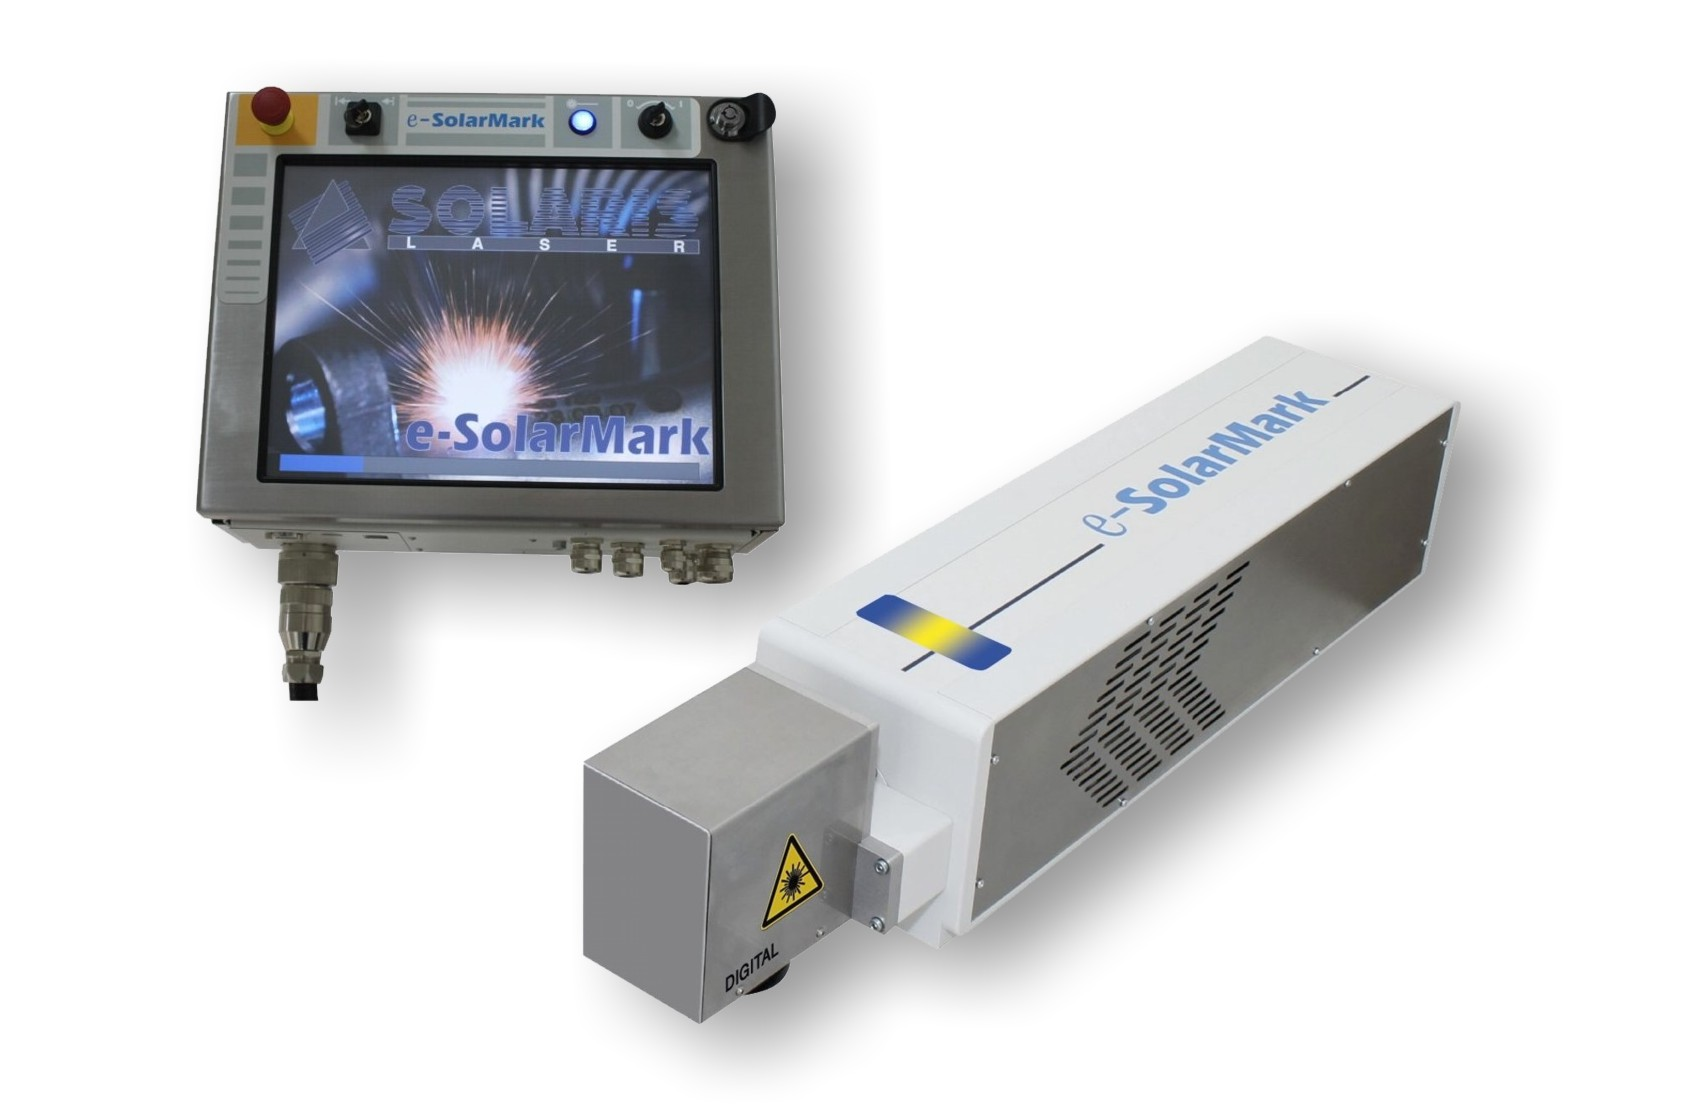 e-SolarMark+